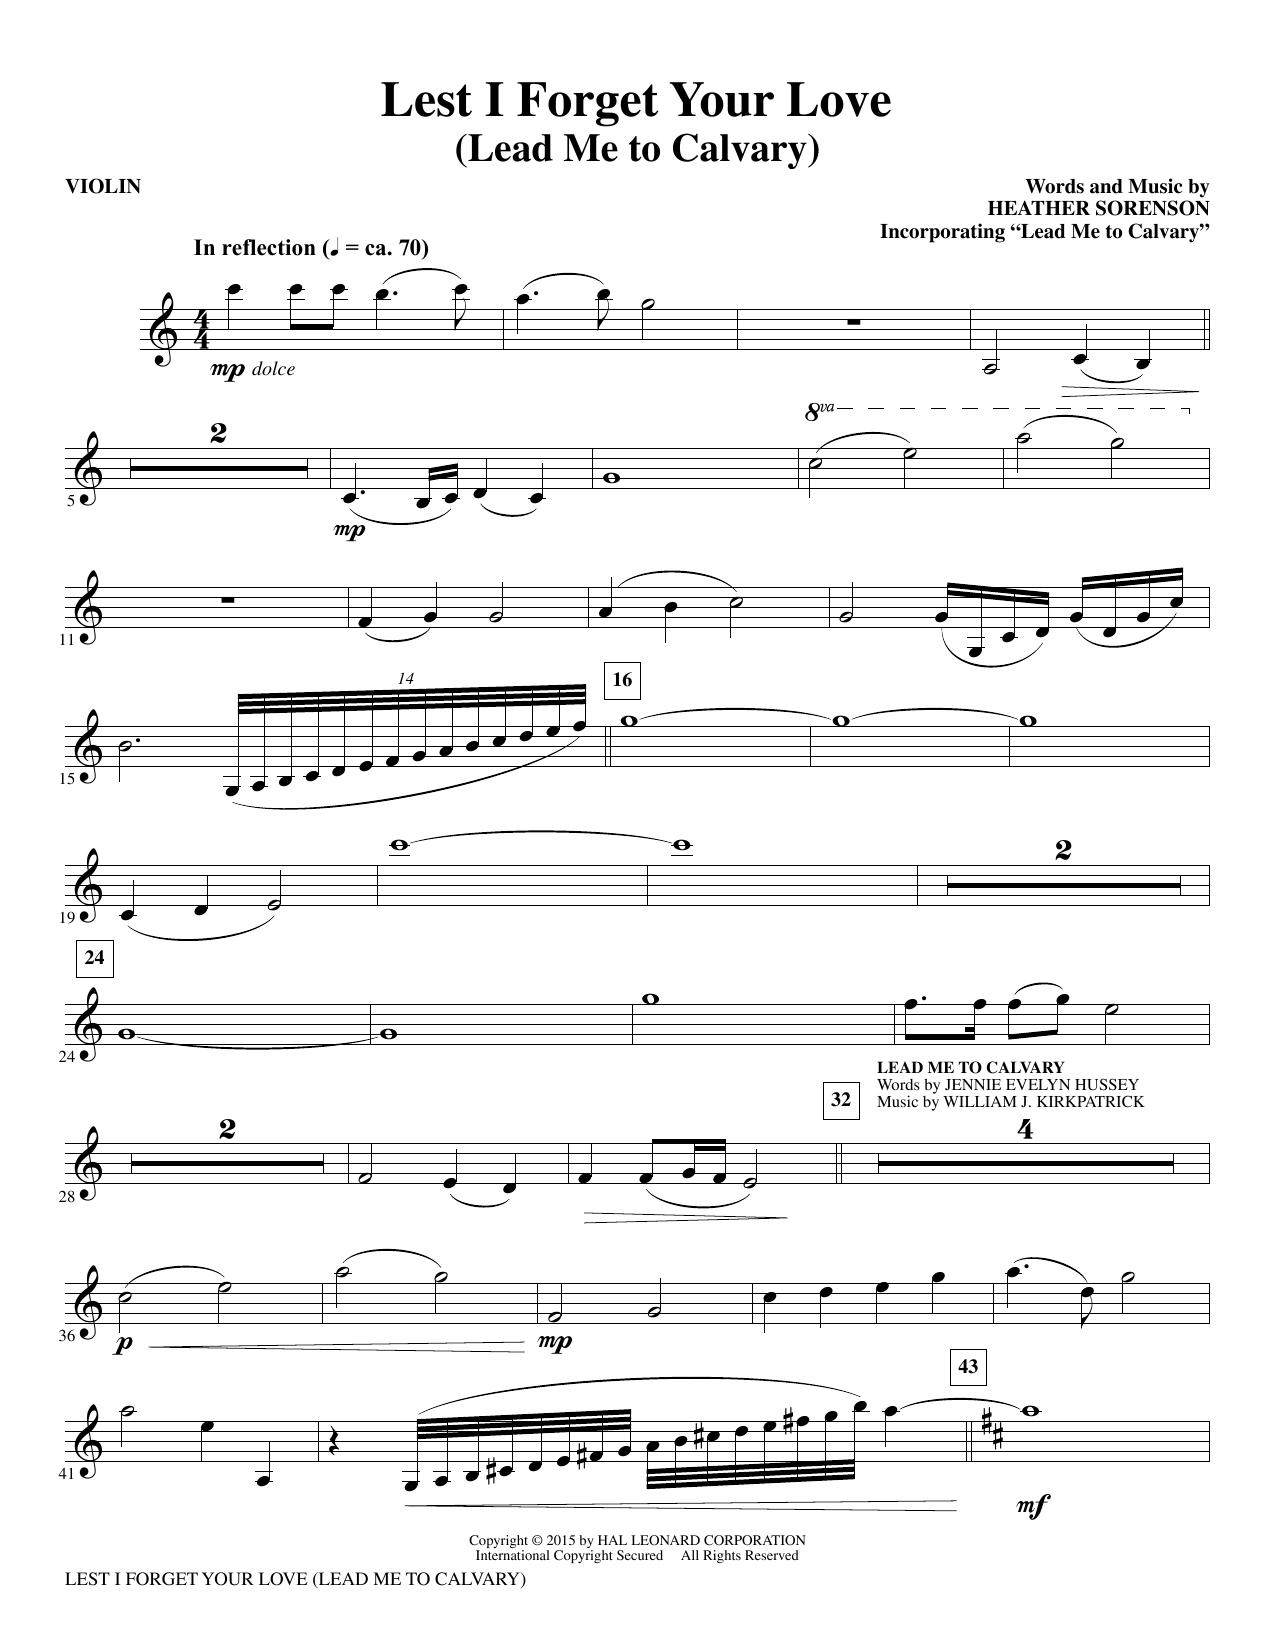 Lest I Forget Your Love - Violin sheet music